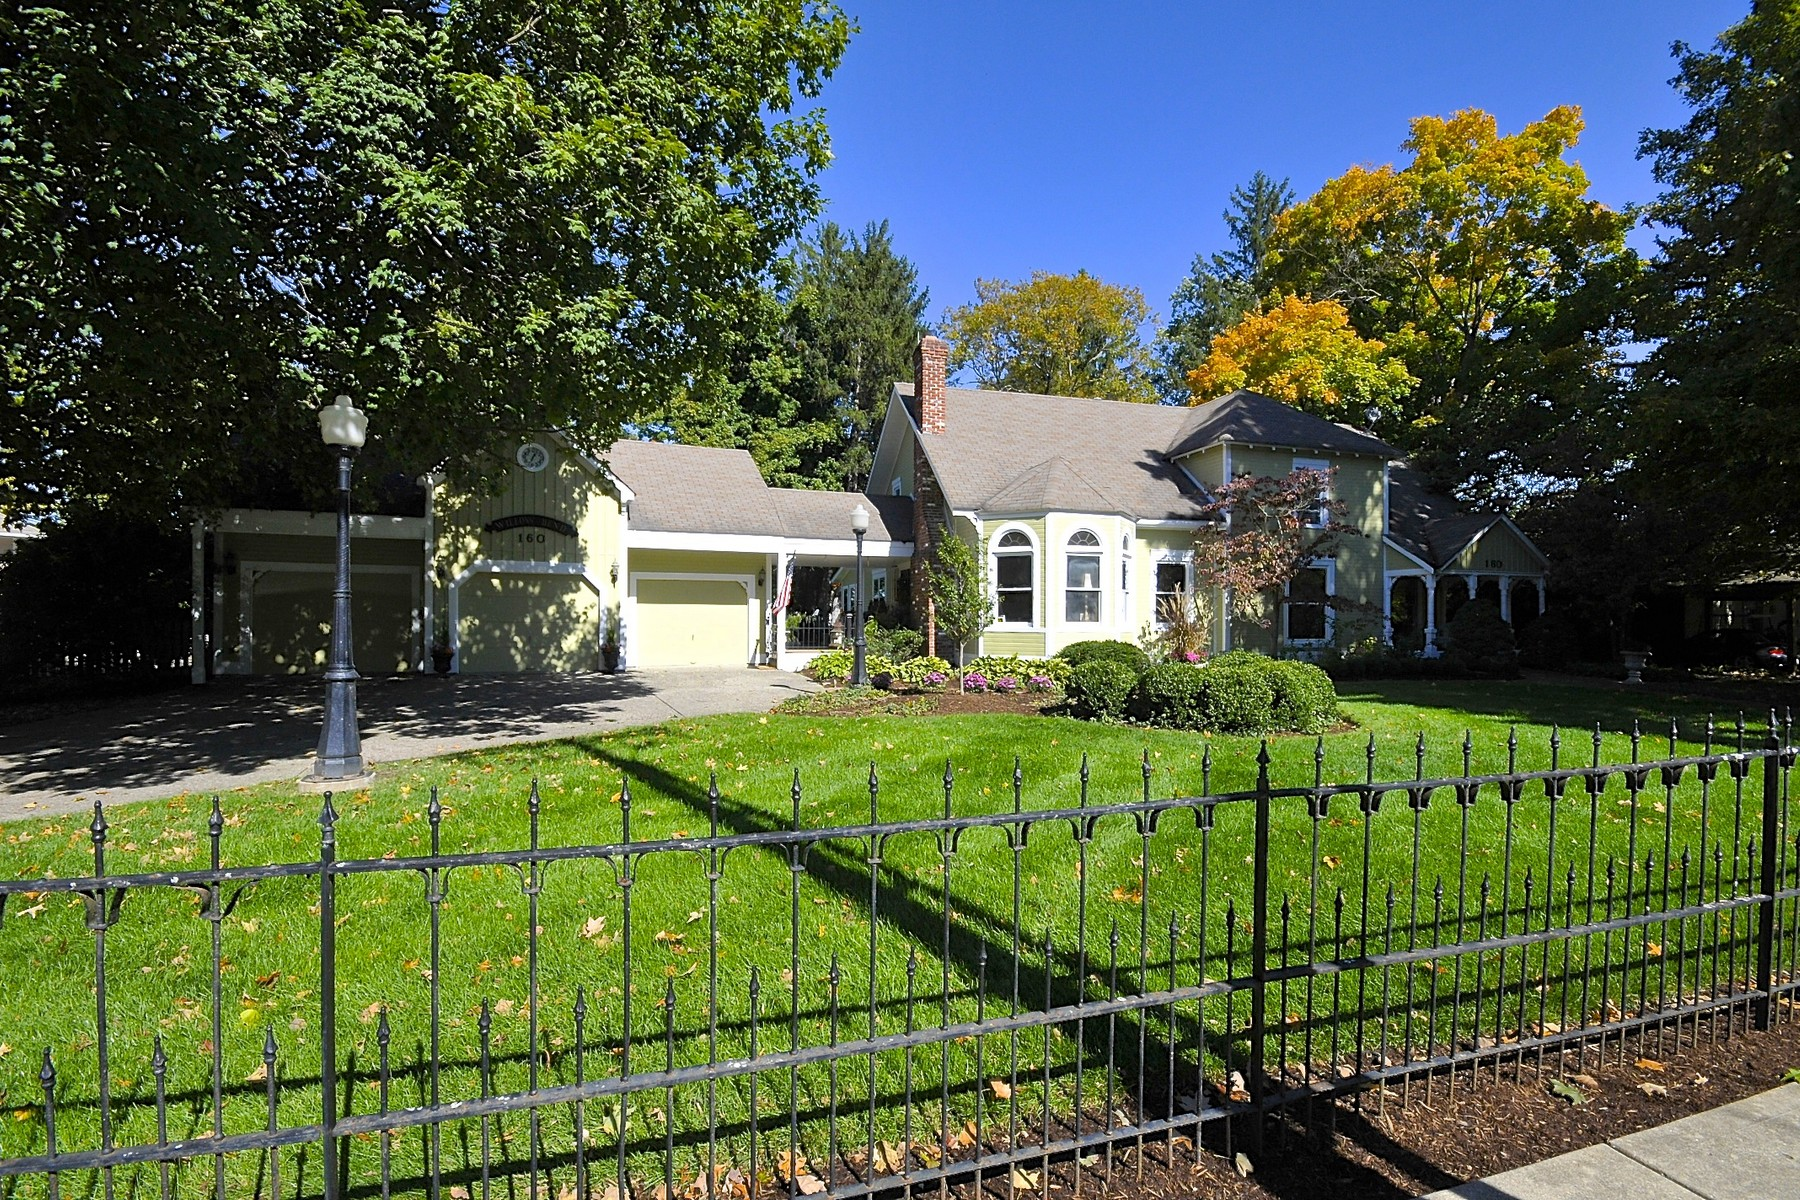 Casa Unifamiliar por un Venta en Lovely, Historic Zionsville Home 160 E Willow St Zionsville, Indiana 46077 Estados Unidos